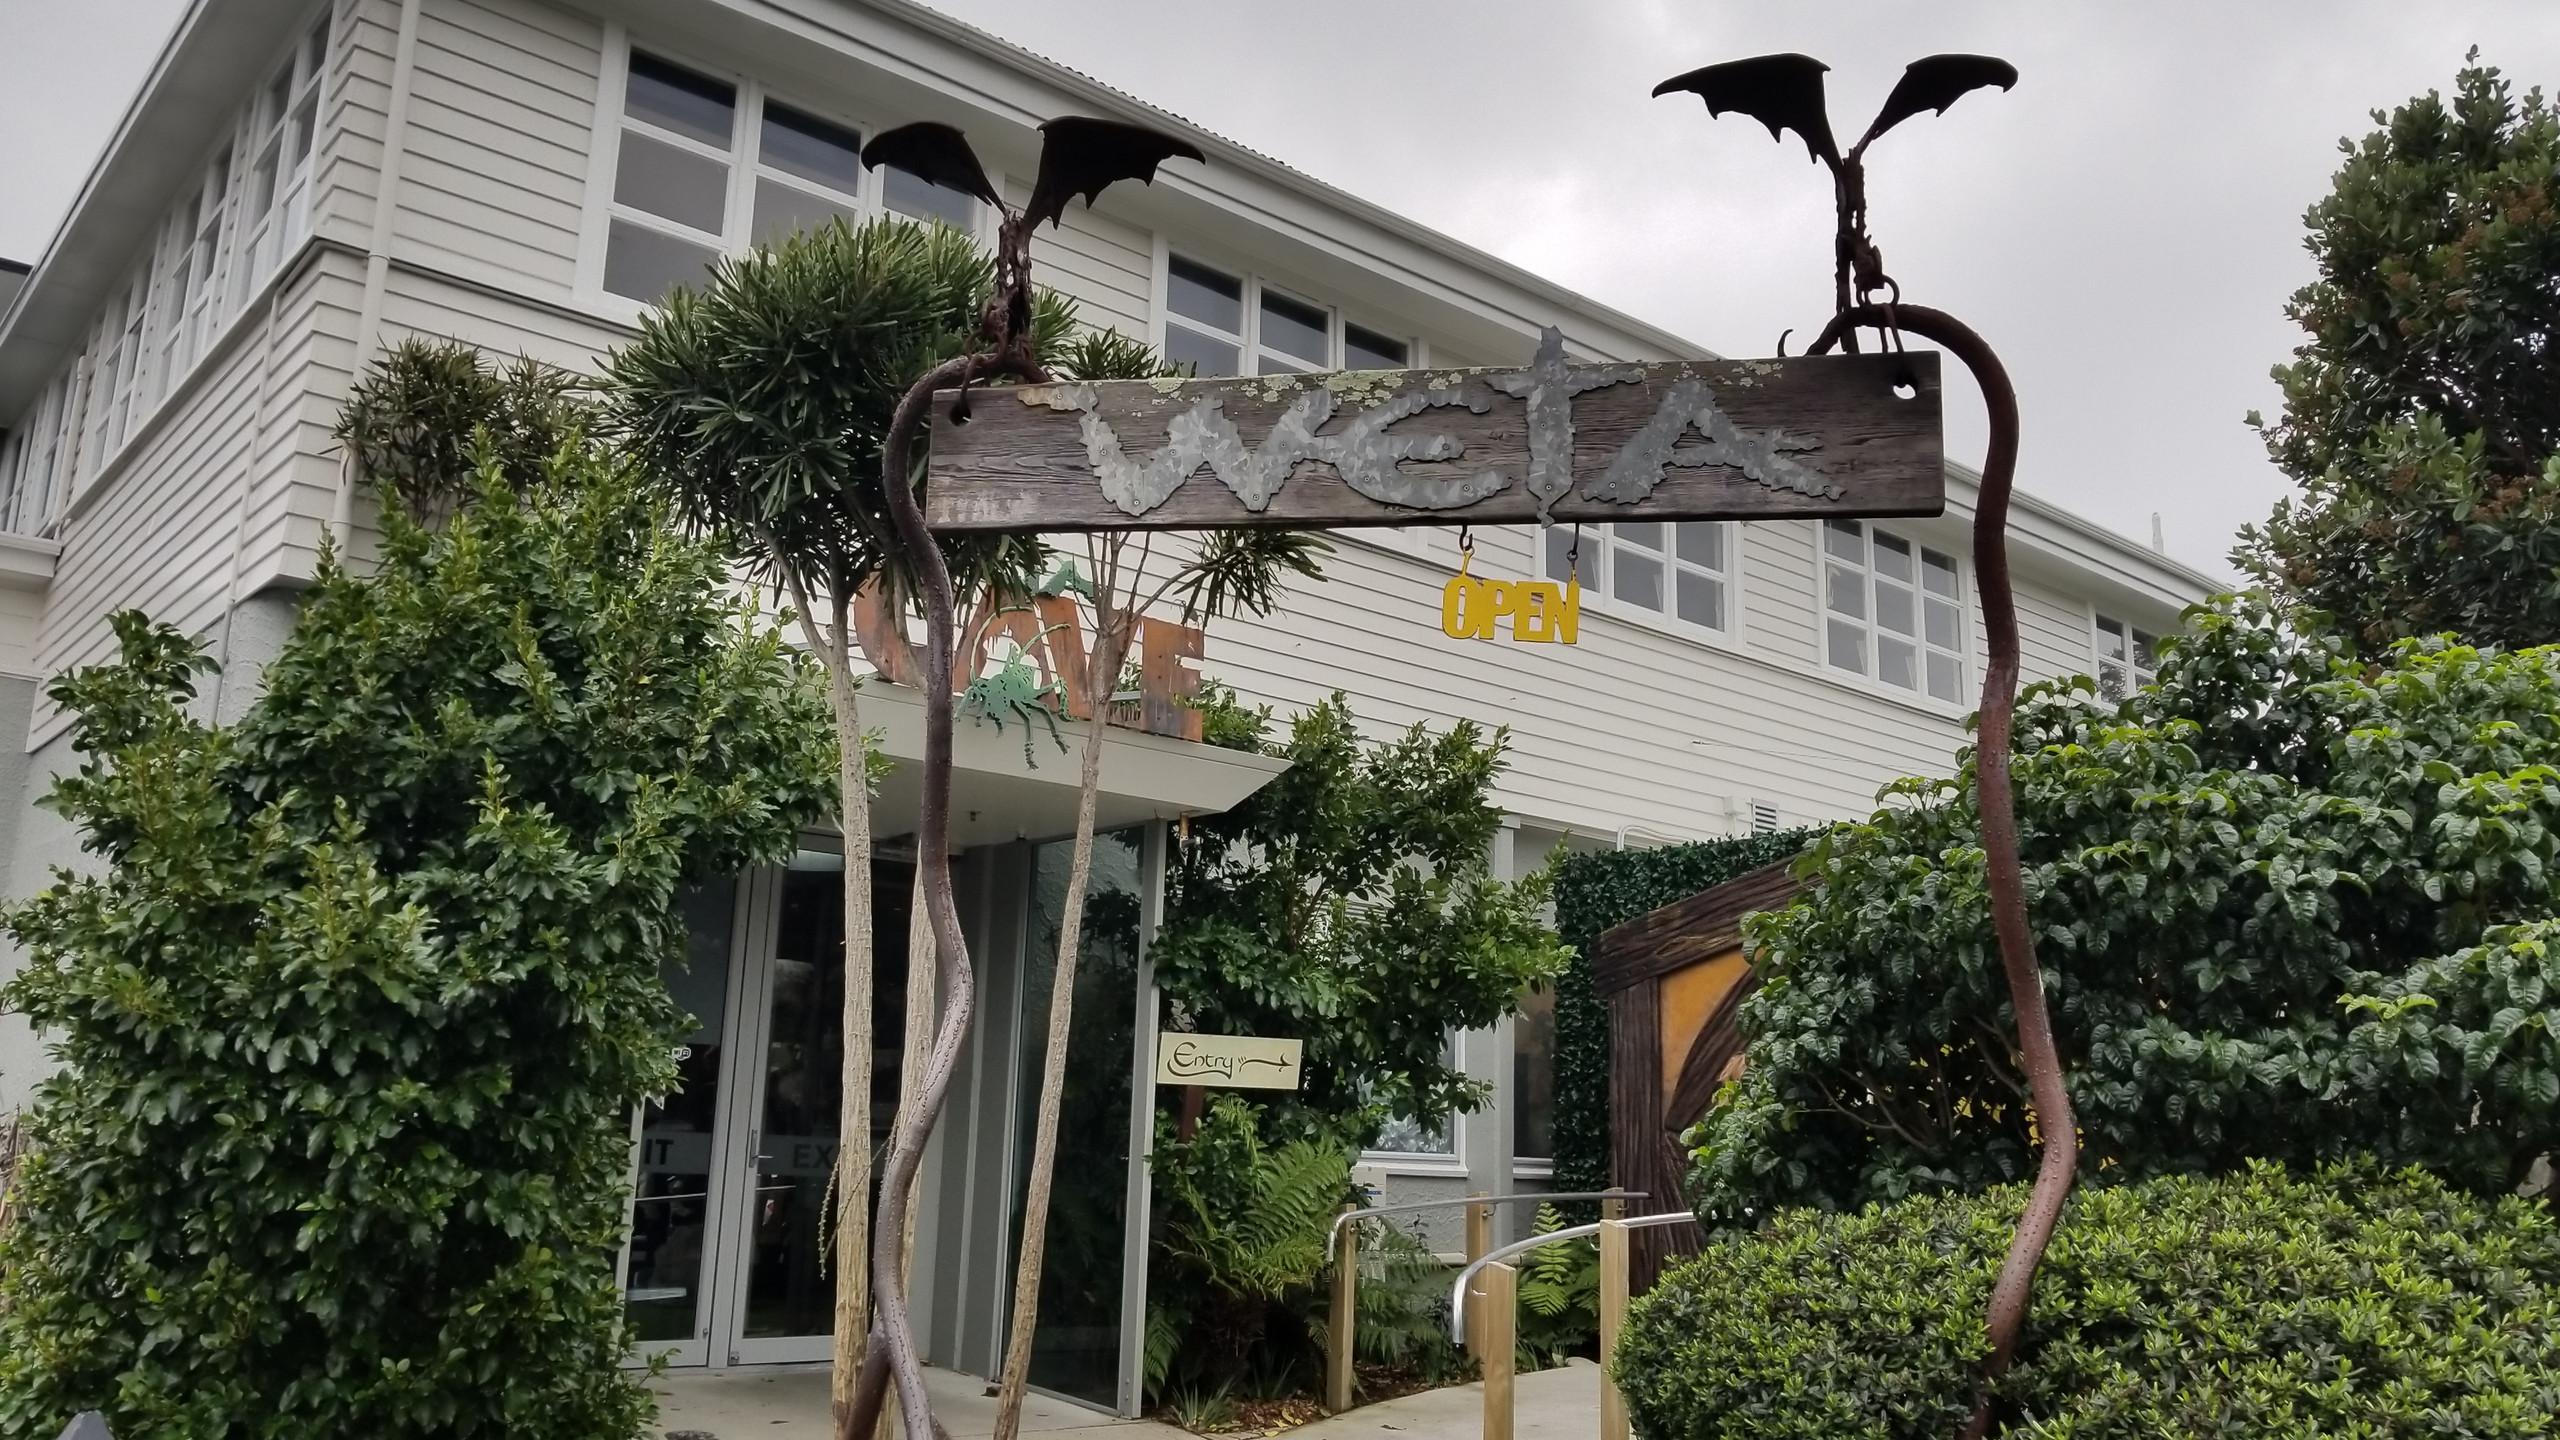 Weta Cave tours, Wellington, New Zealand activities, tours of New Zealand